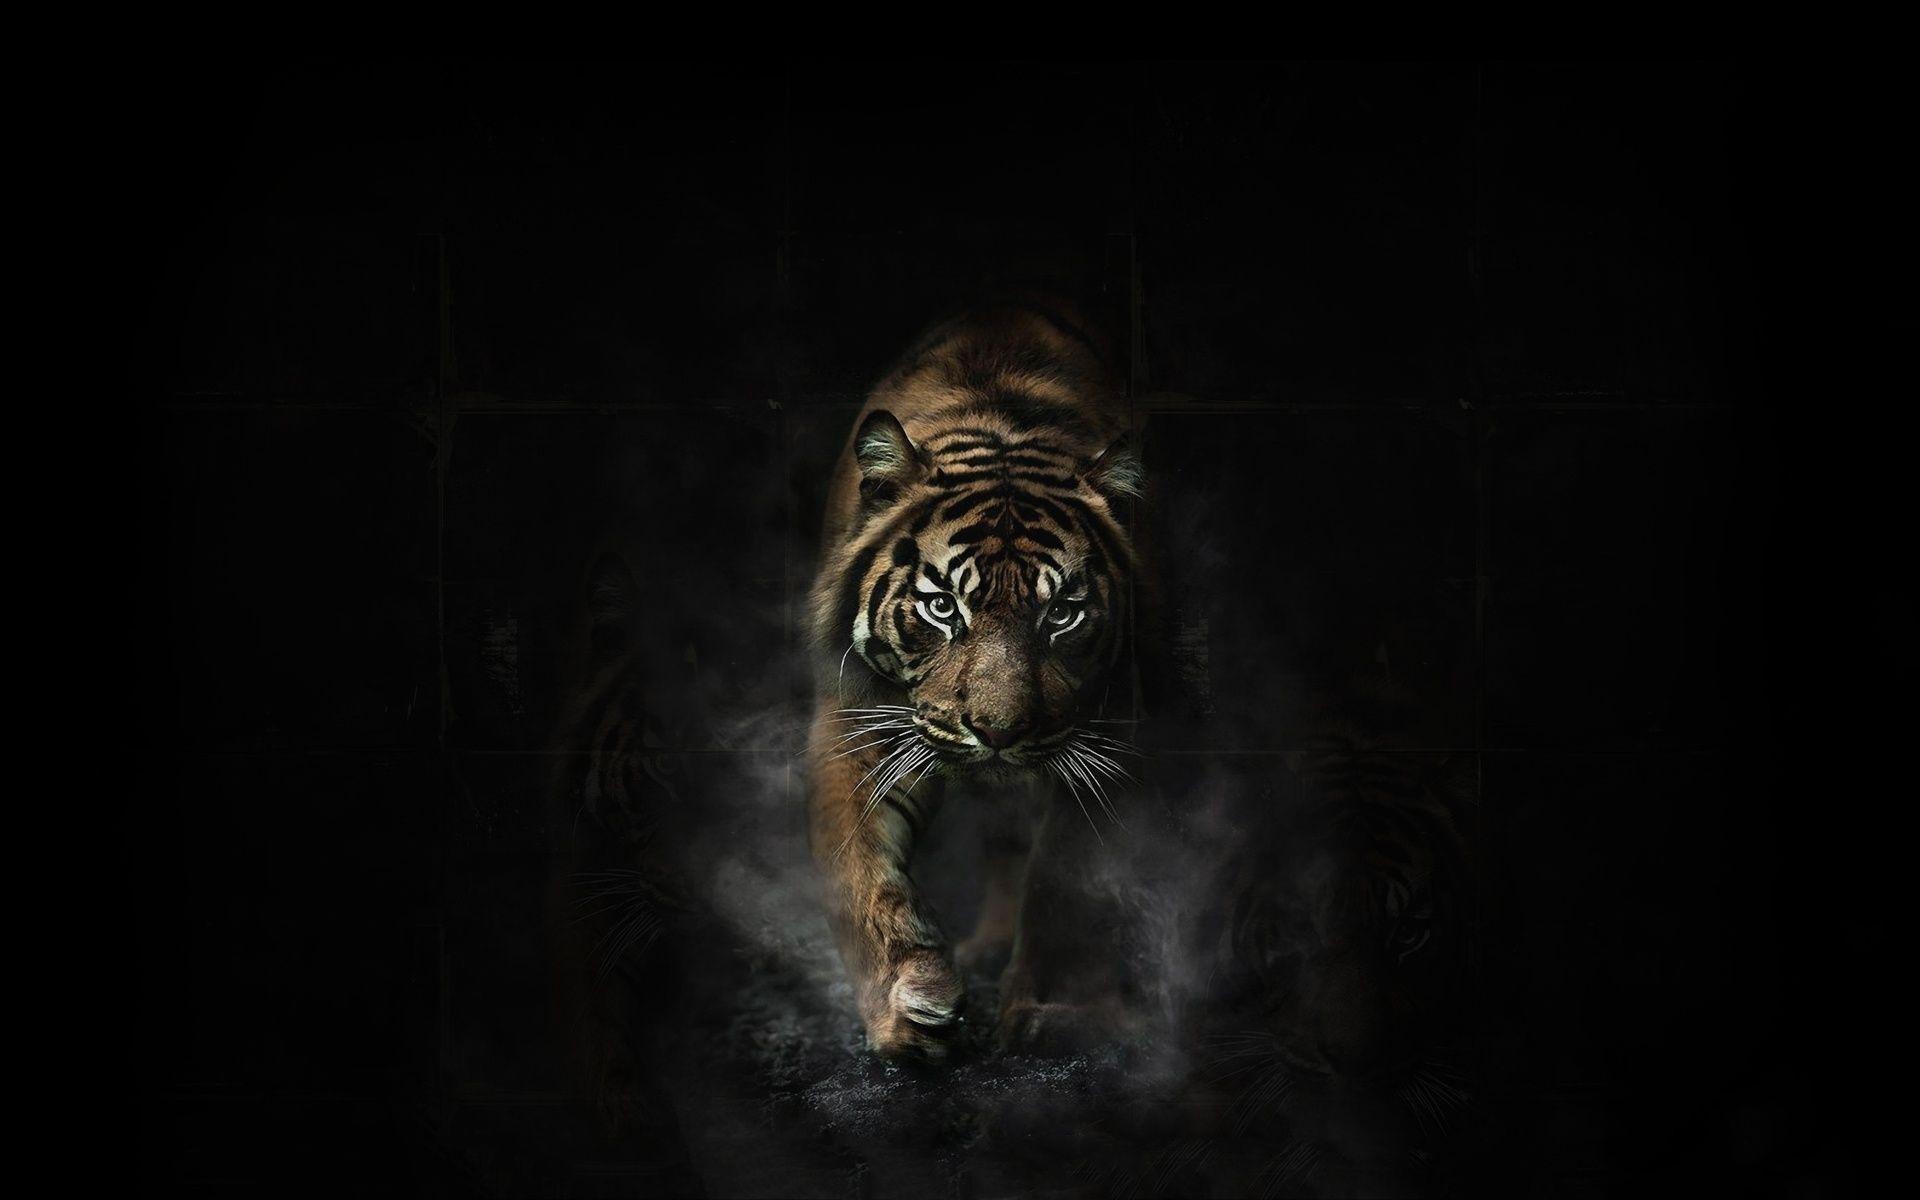 Beautiful Black Tiger Eyes Wallpaper Pictures